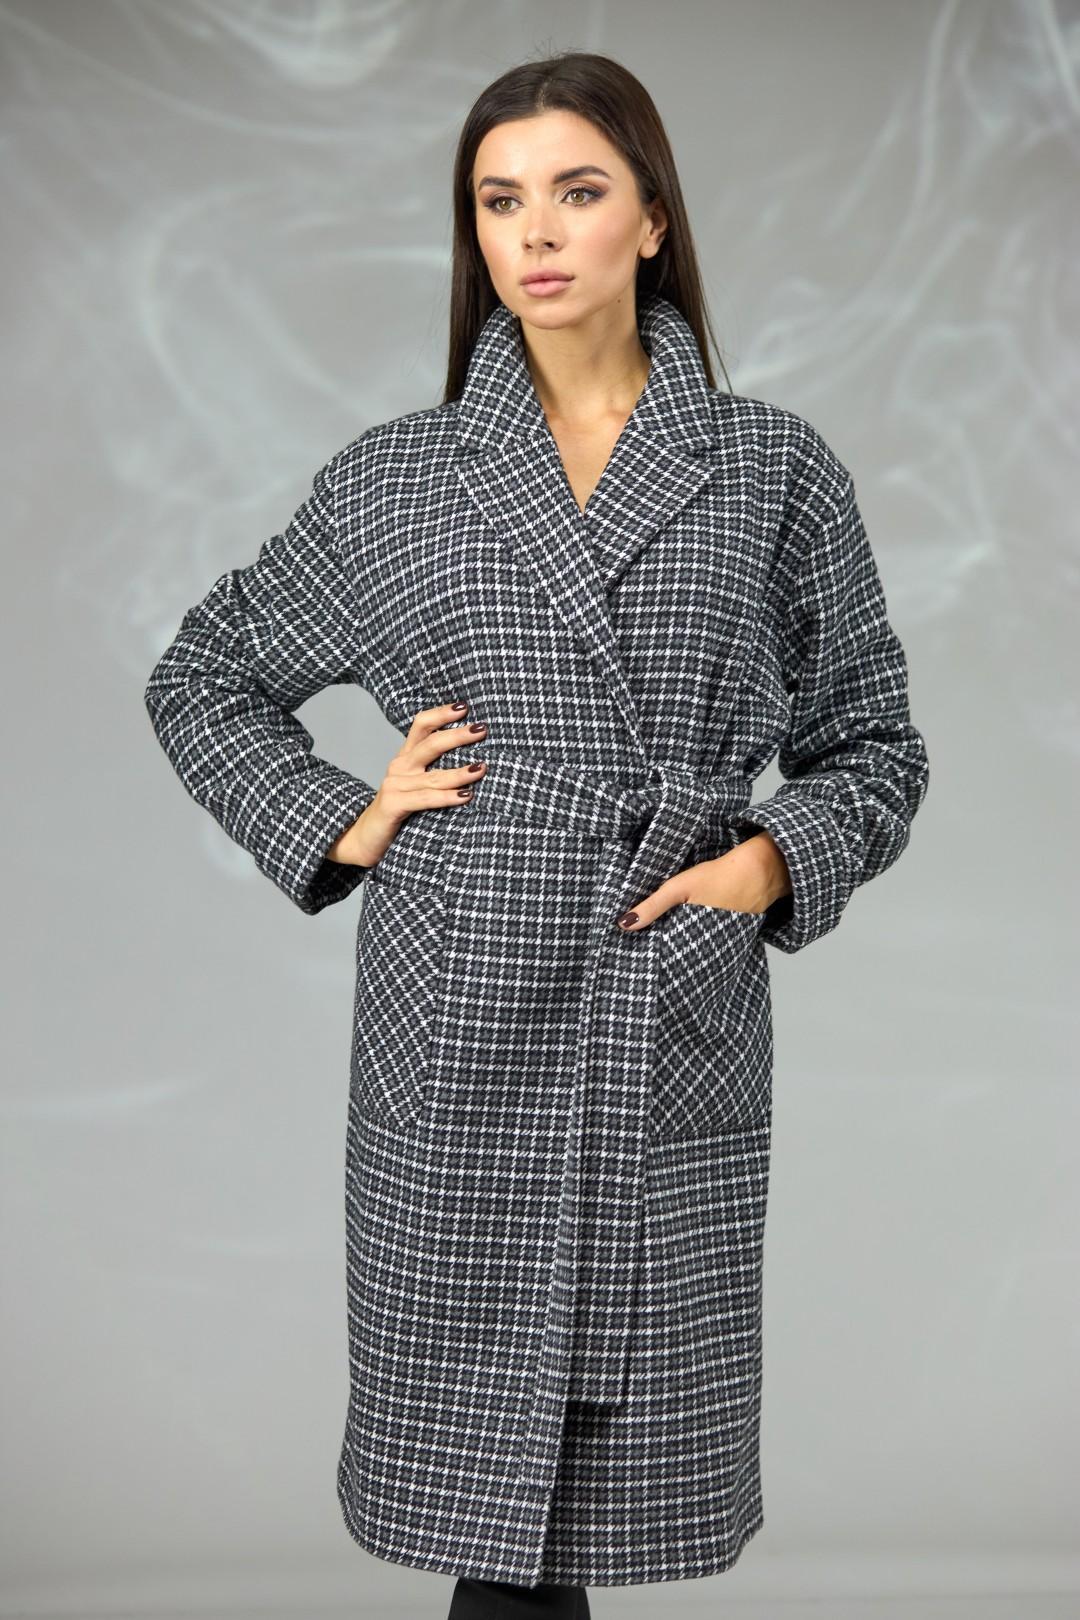 Пальто Angelina & Company 605 ч/б клетка